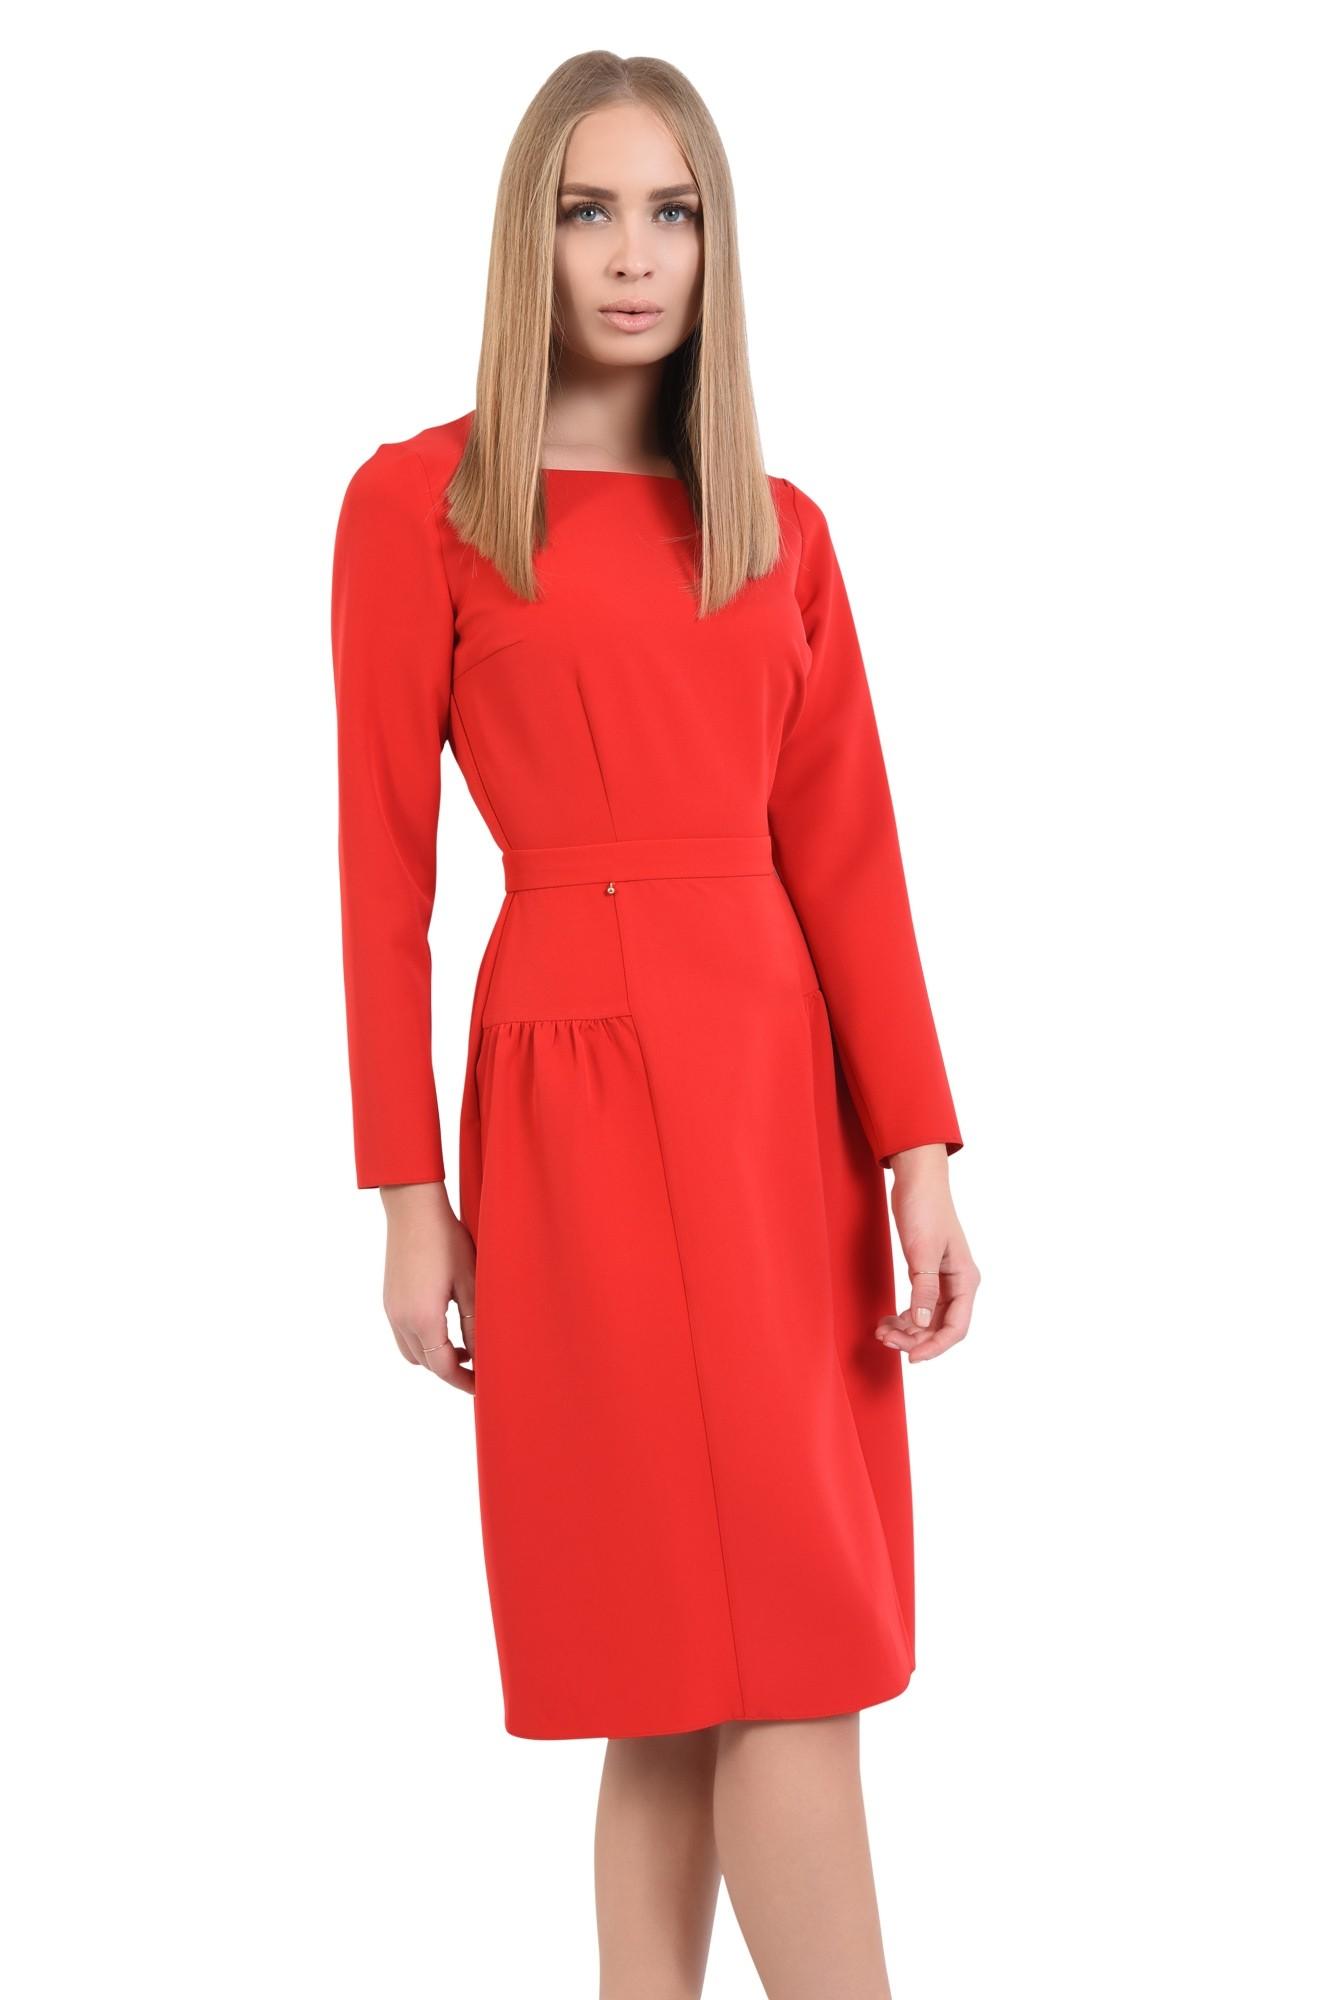 0 - rochii de dama online, betelie, croi evazat, inchidere cu fermoar